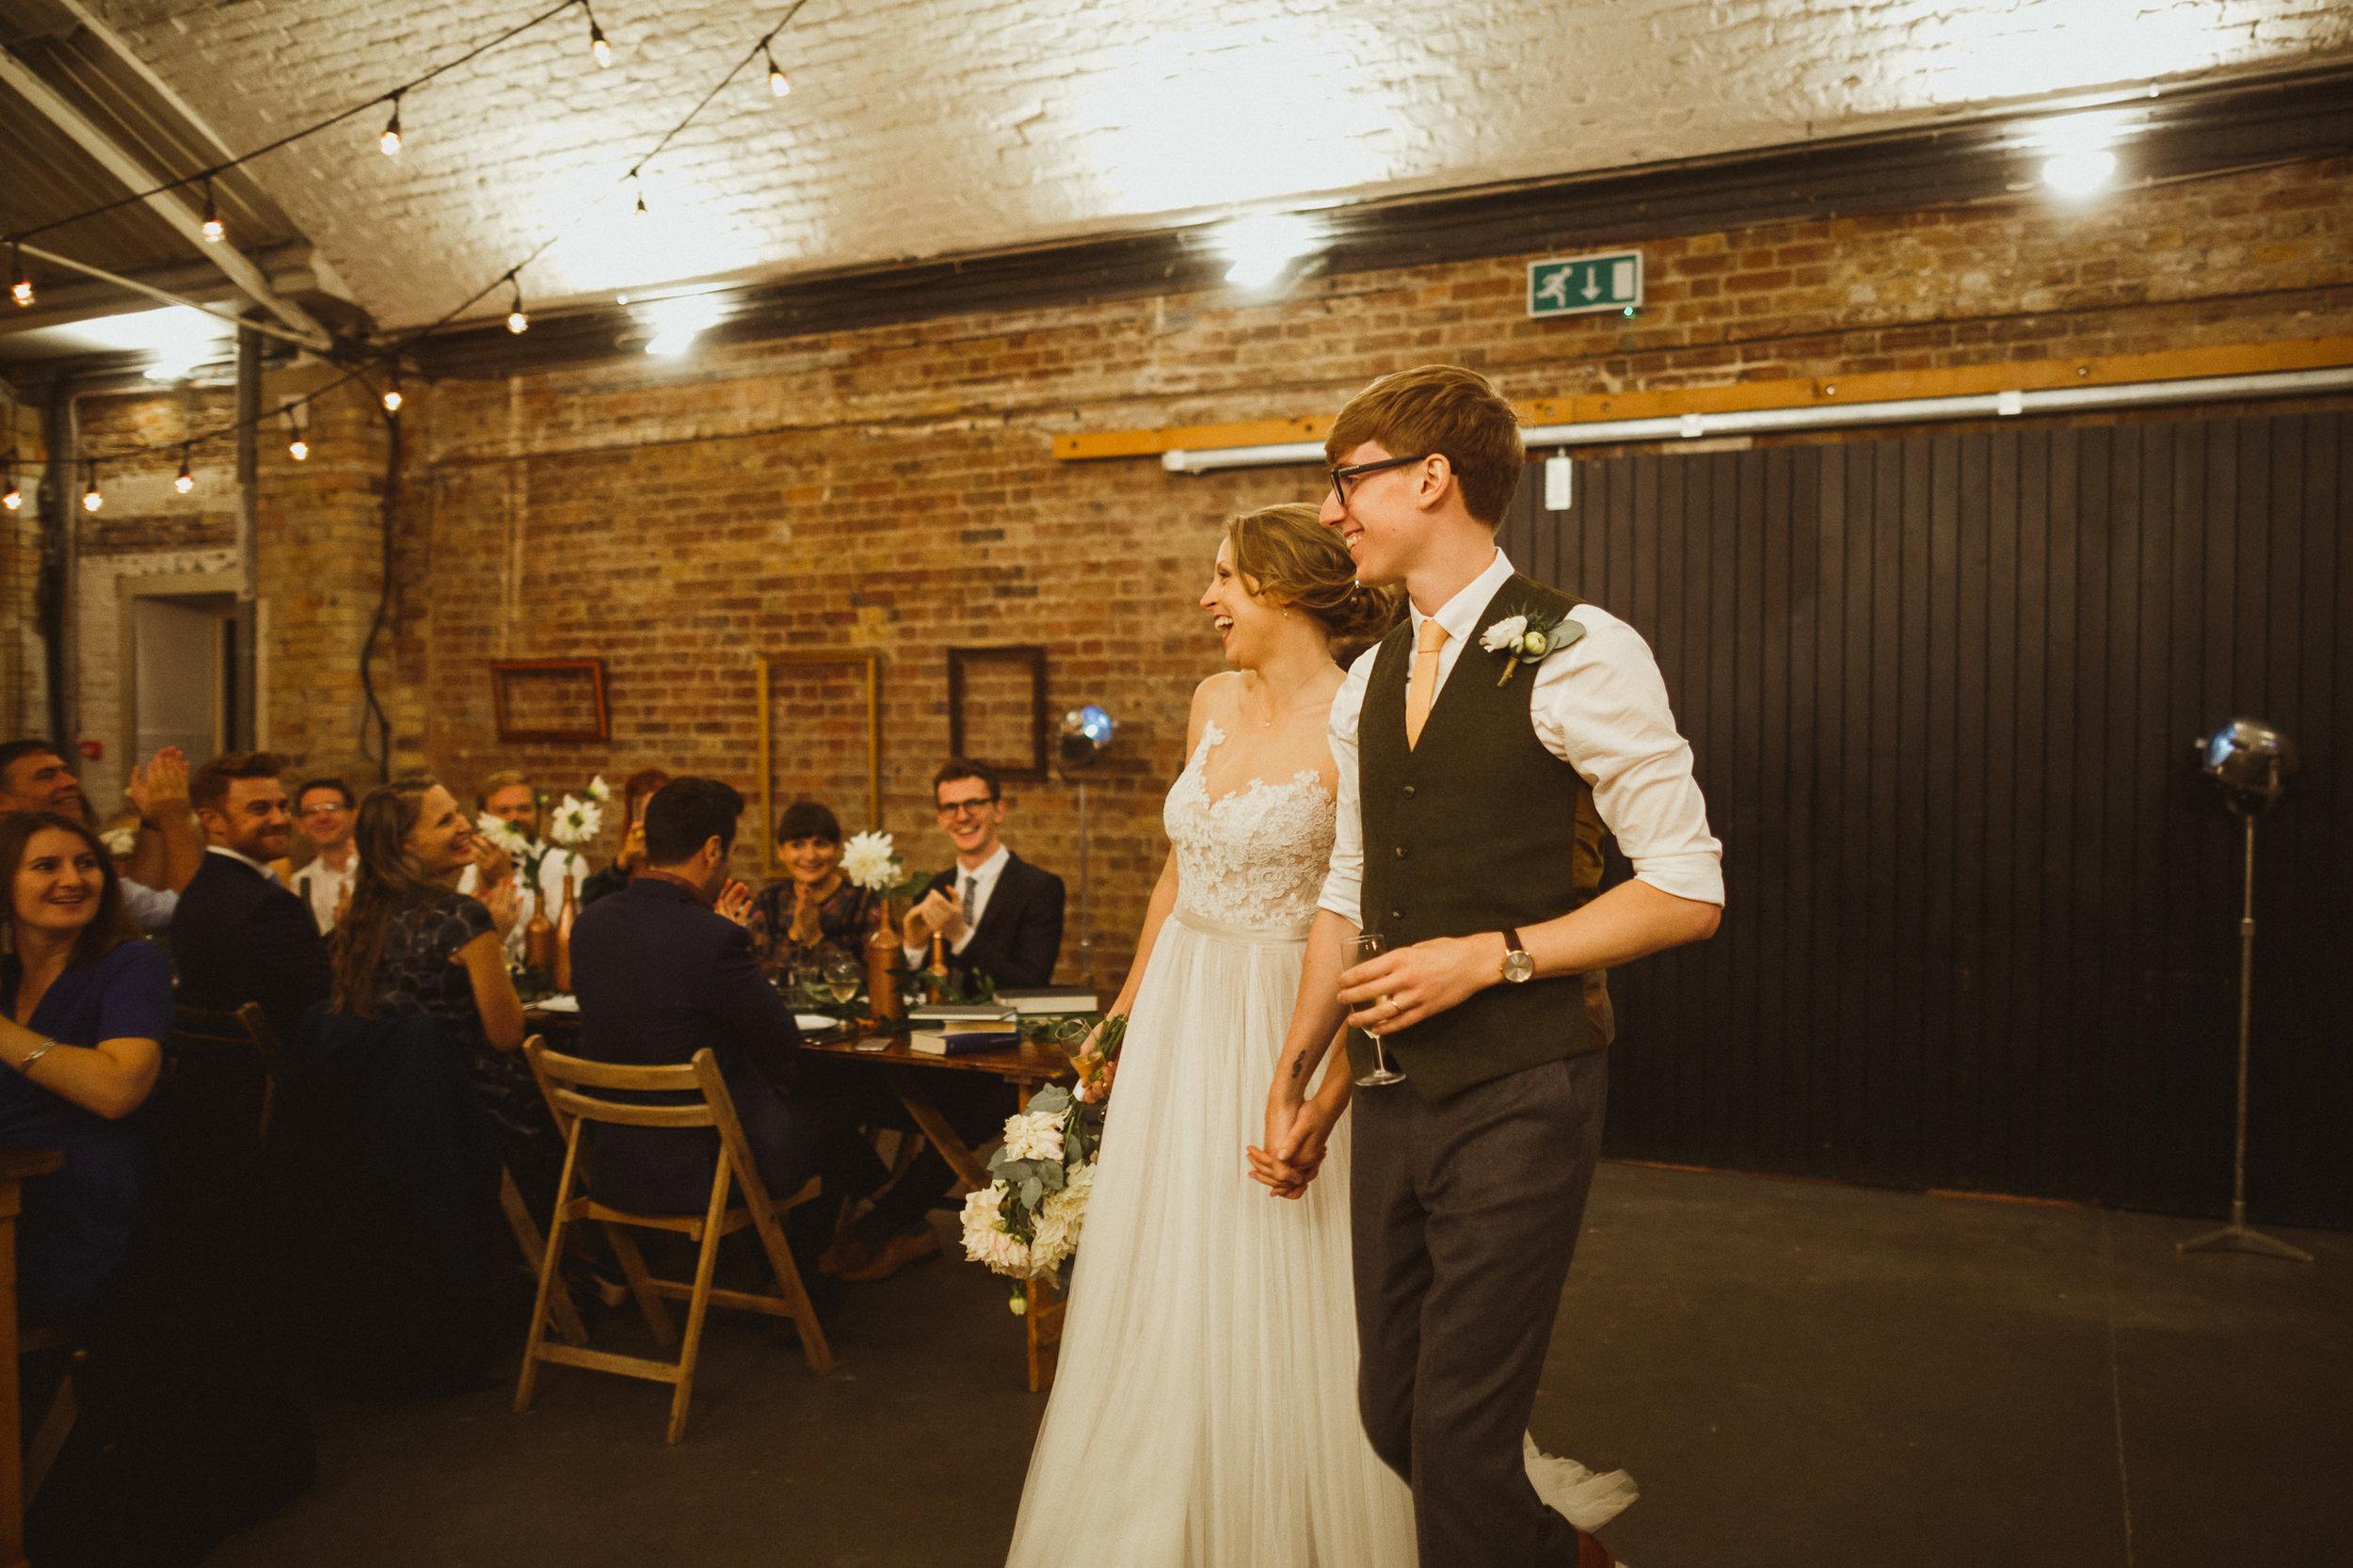 London-wedding-photographer-gione-da-silva-alex_paul-184.jpg